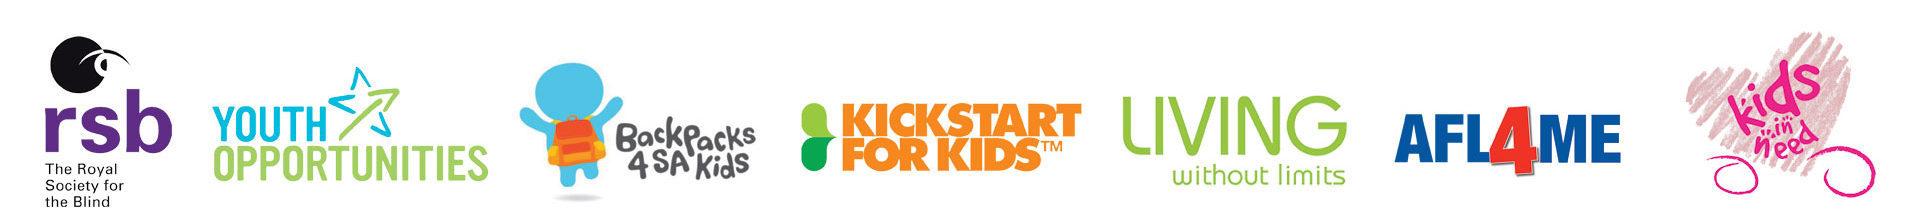 charity-logos-1920x222-1920x222